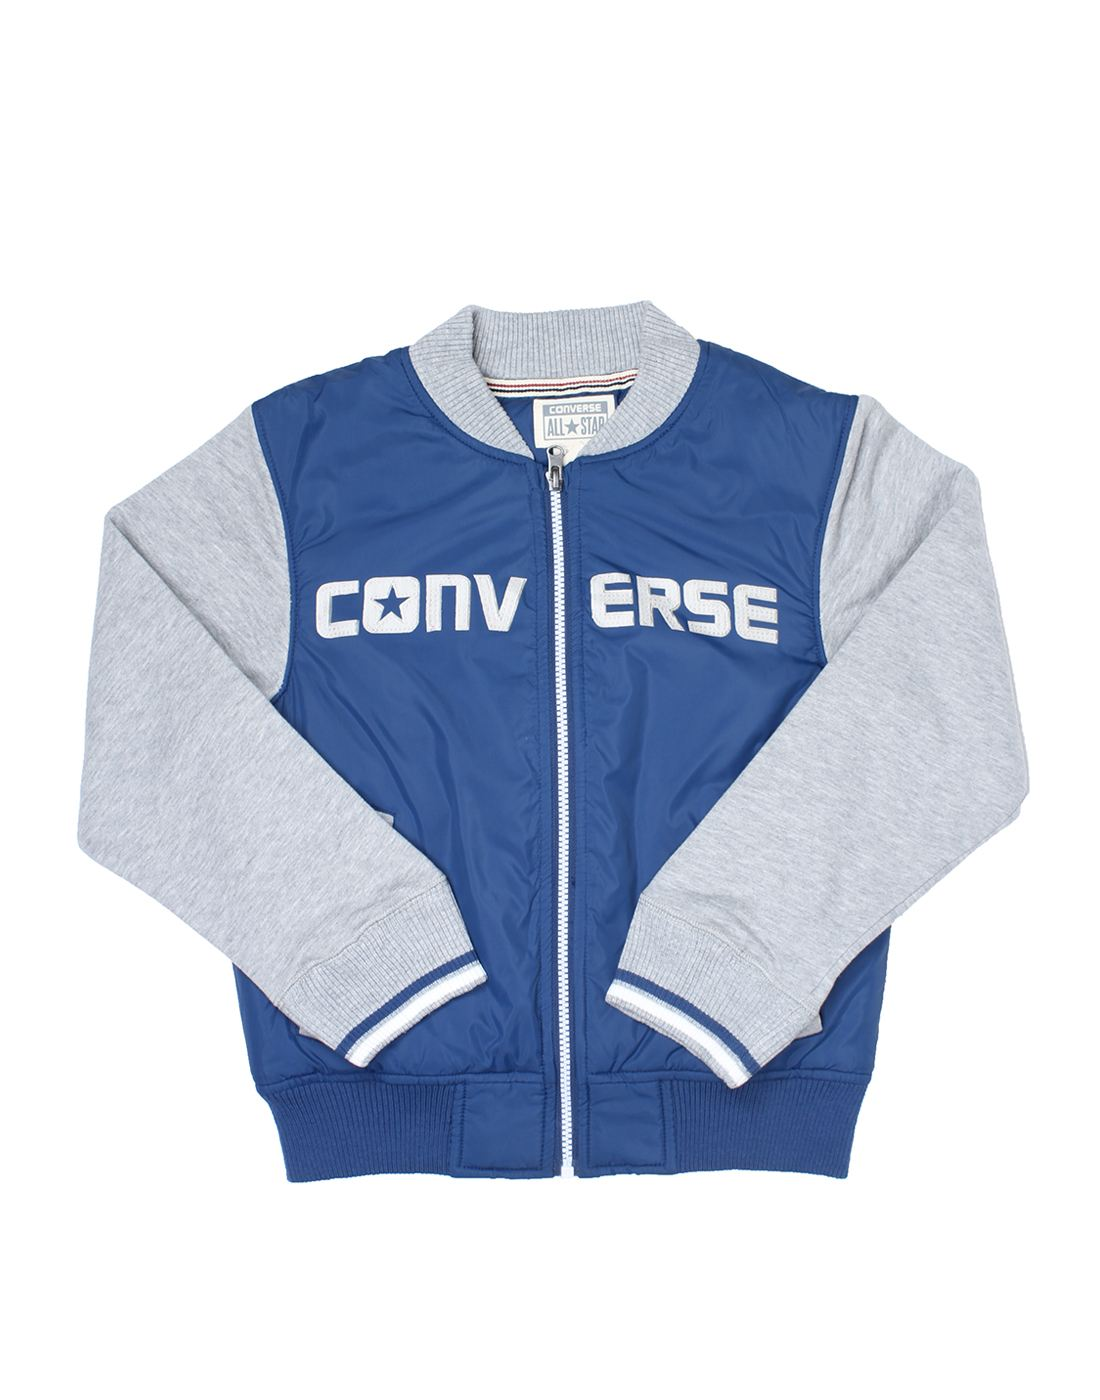 Converse Boys Blue Sweatshirt